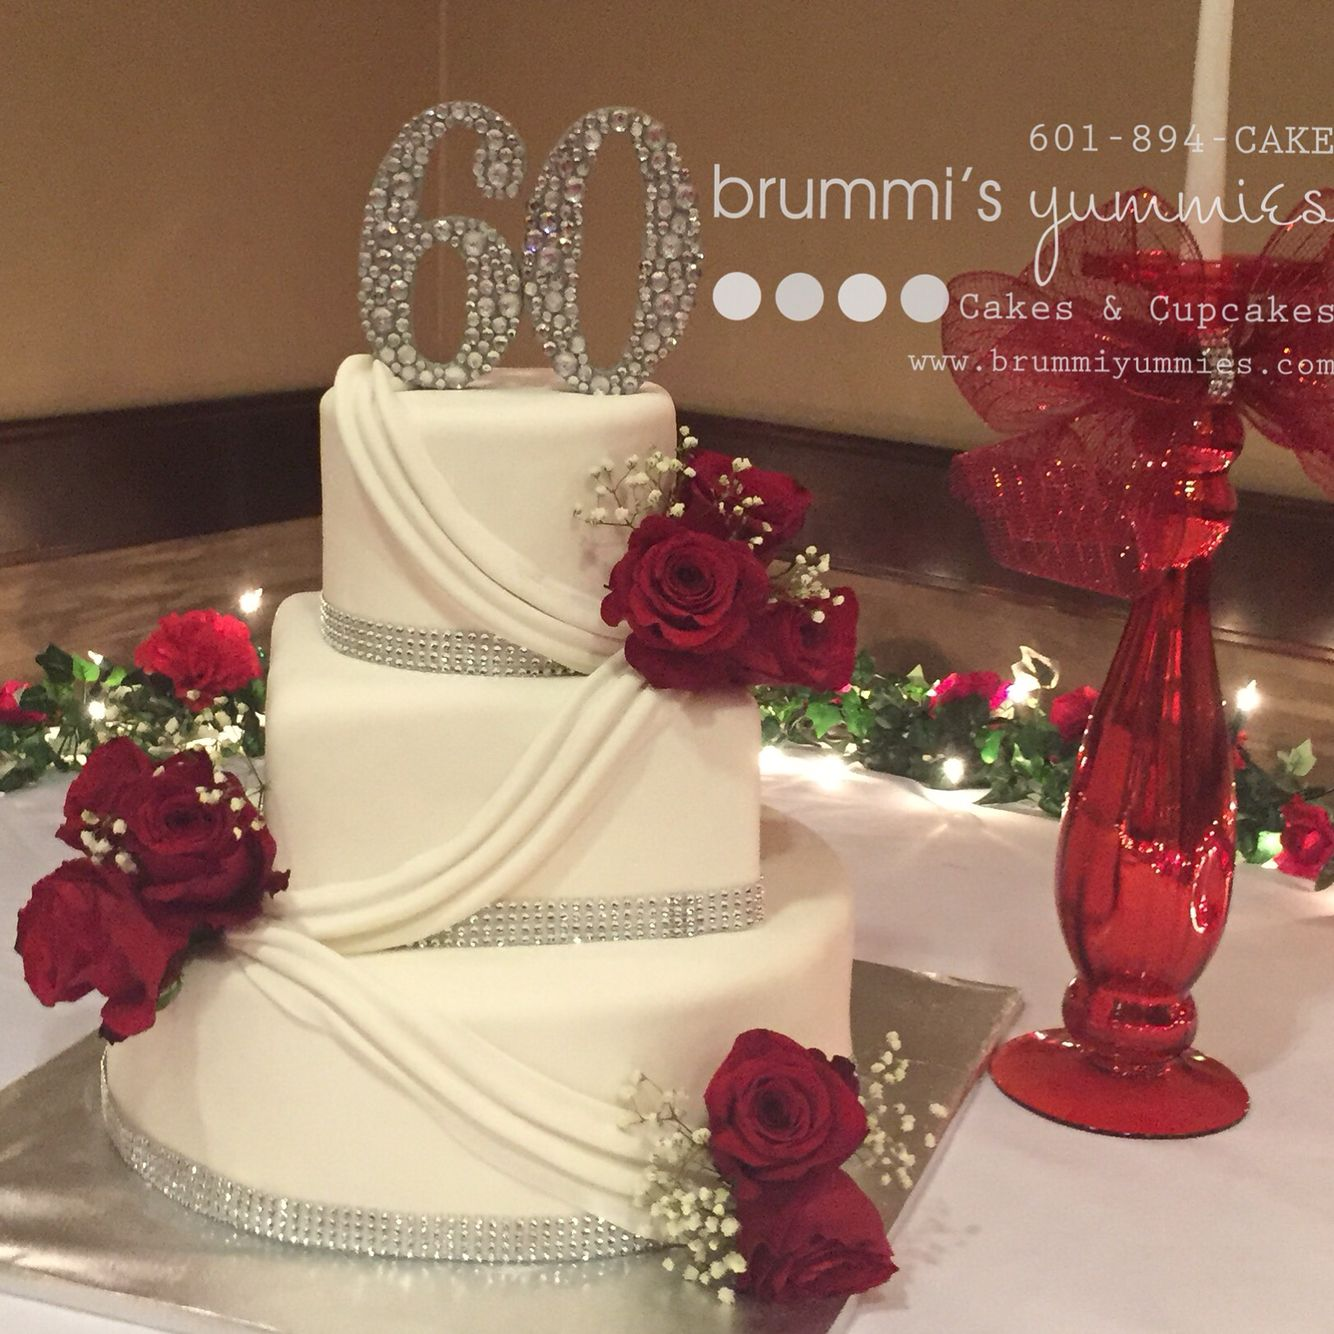 60th Anniversary cake 60th anniversary cakes, 60th